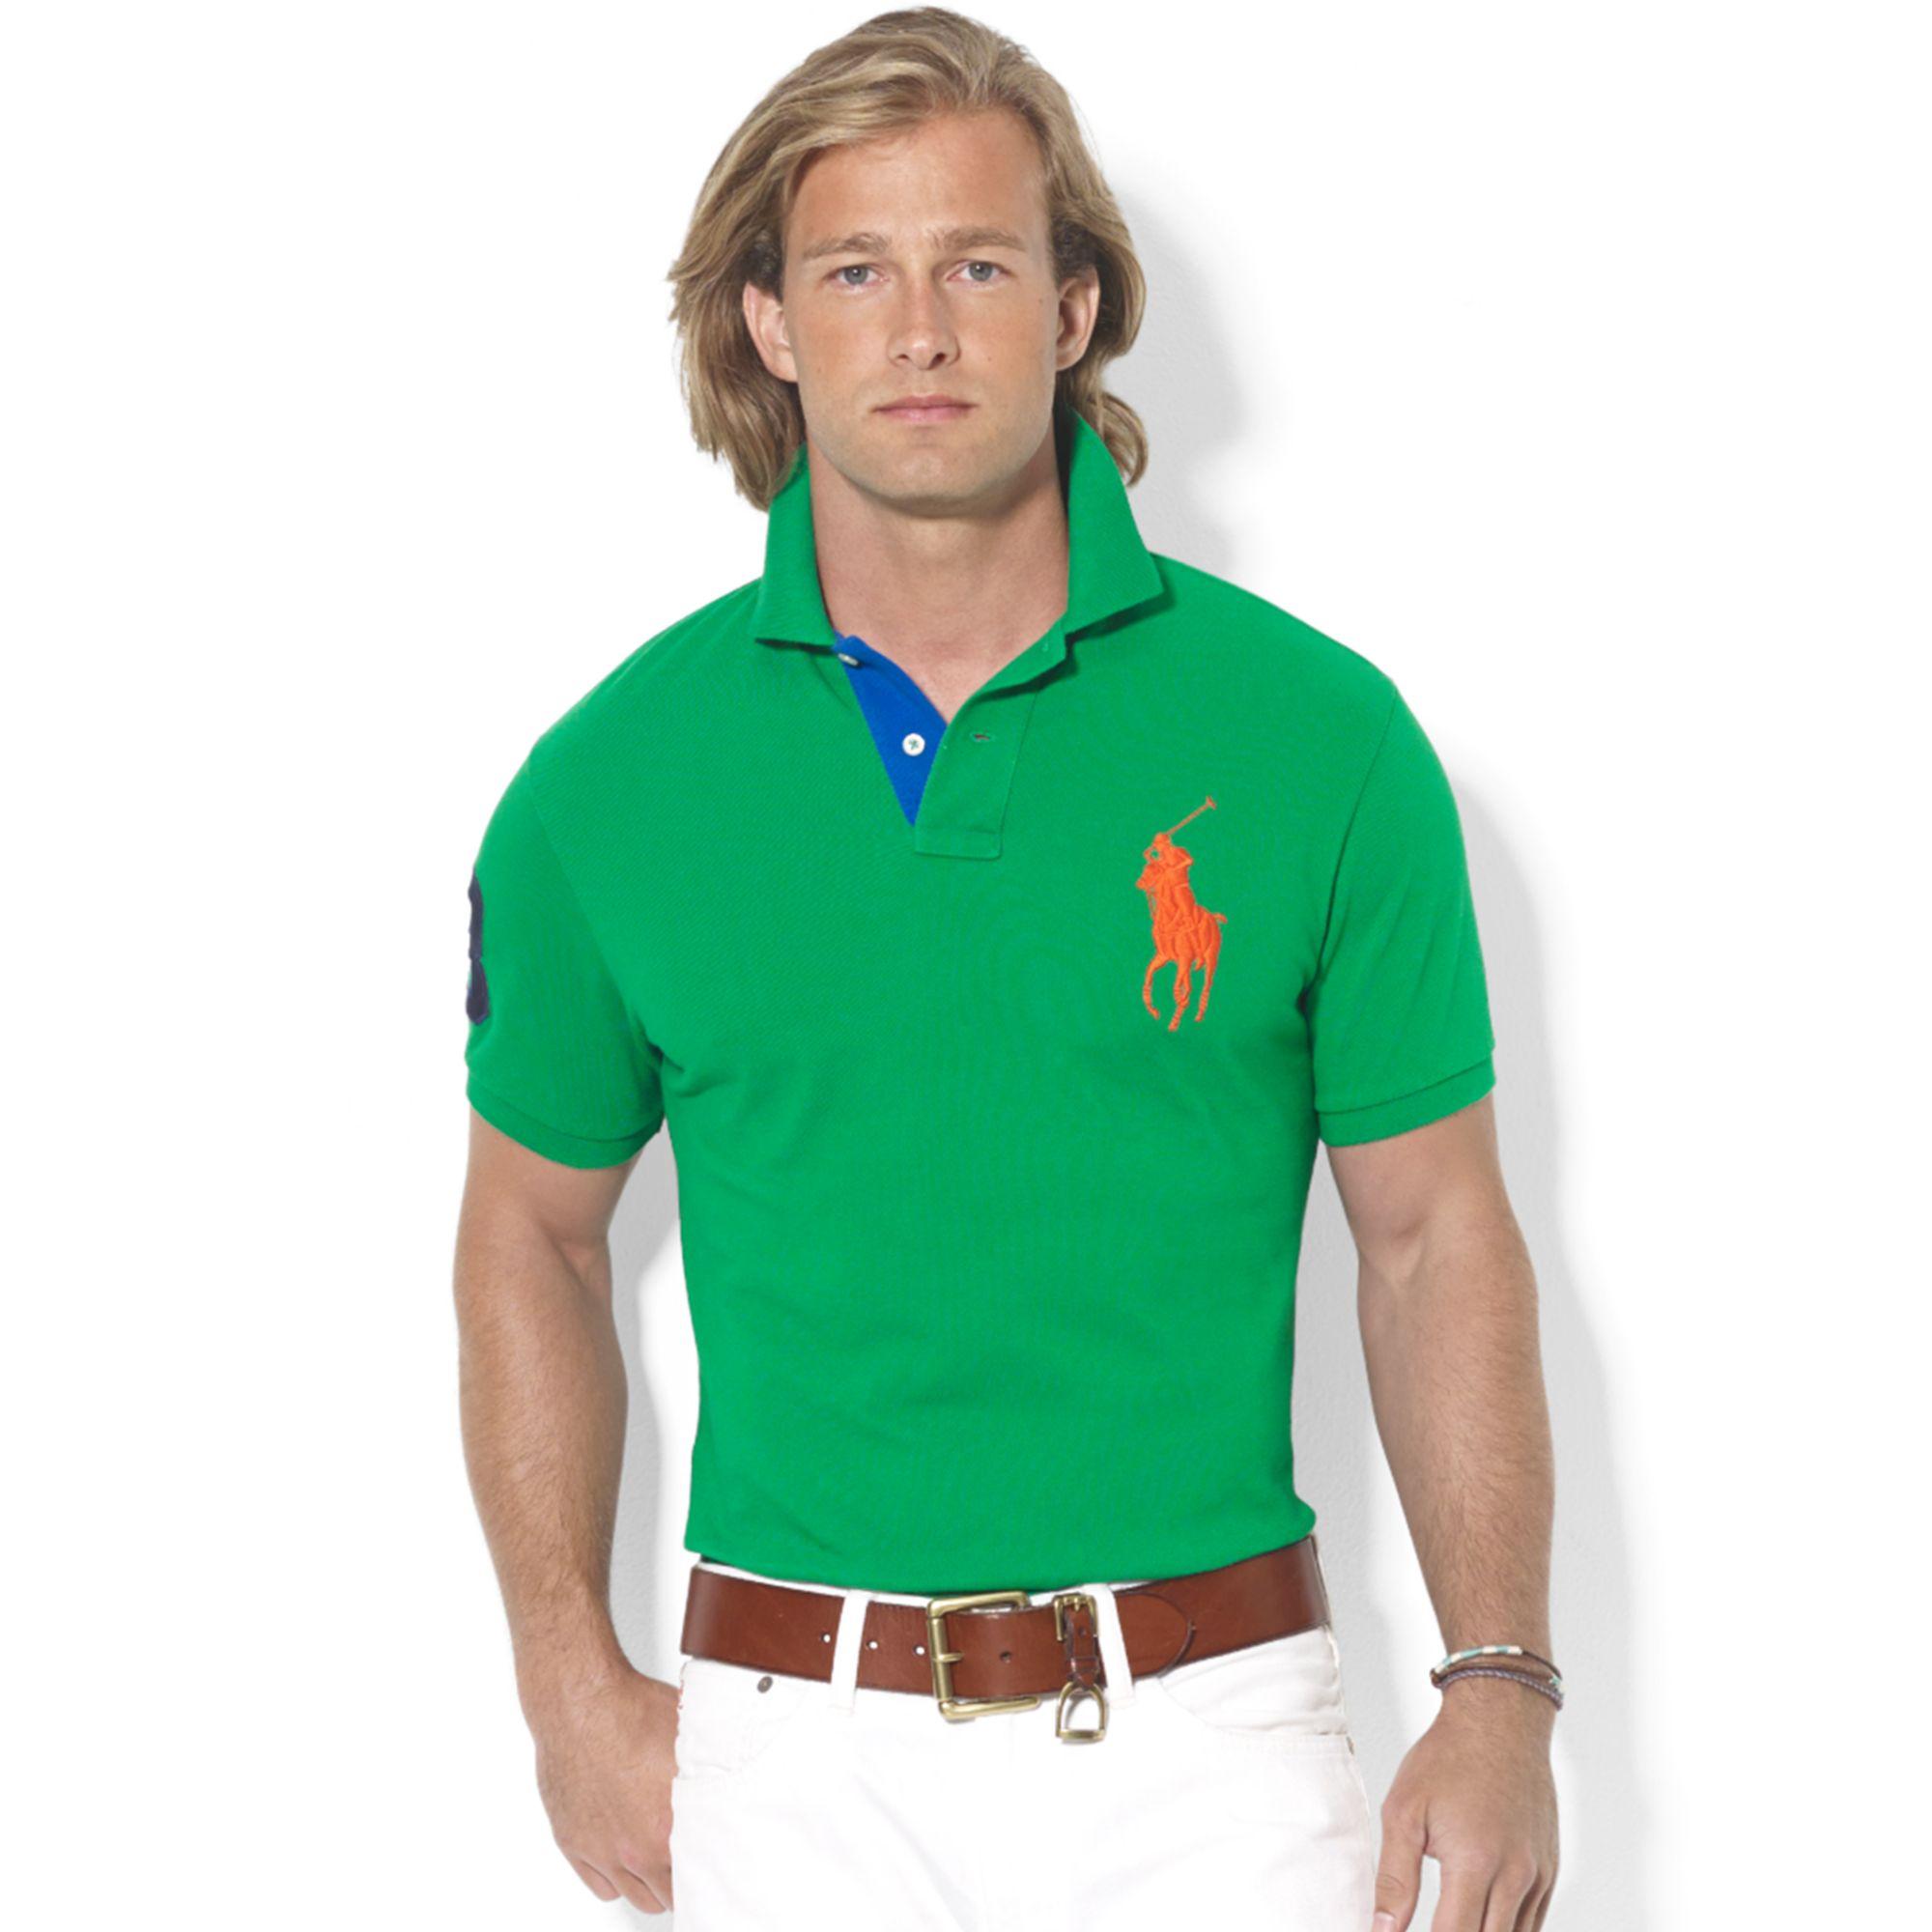 6a010803fa Lyst - Ralph Lauren Custom Fit Big Pony Mesh Polo in Green for Men